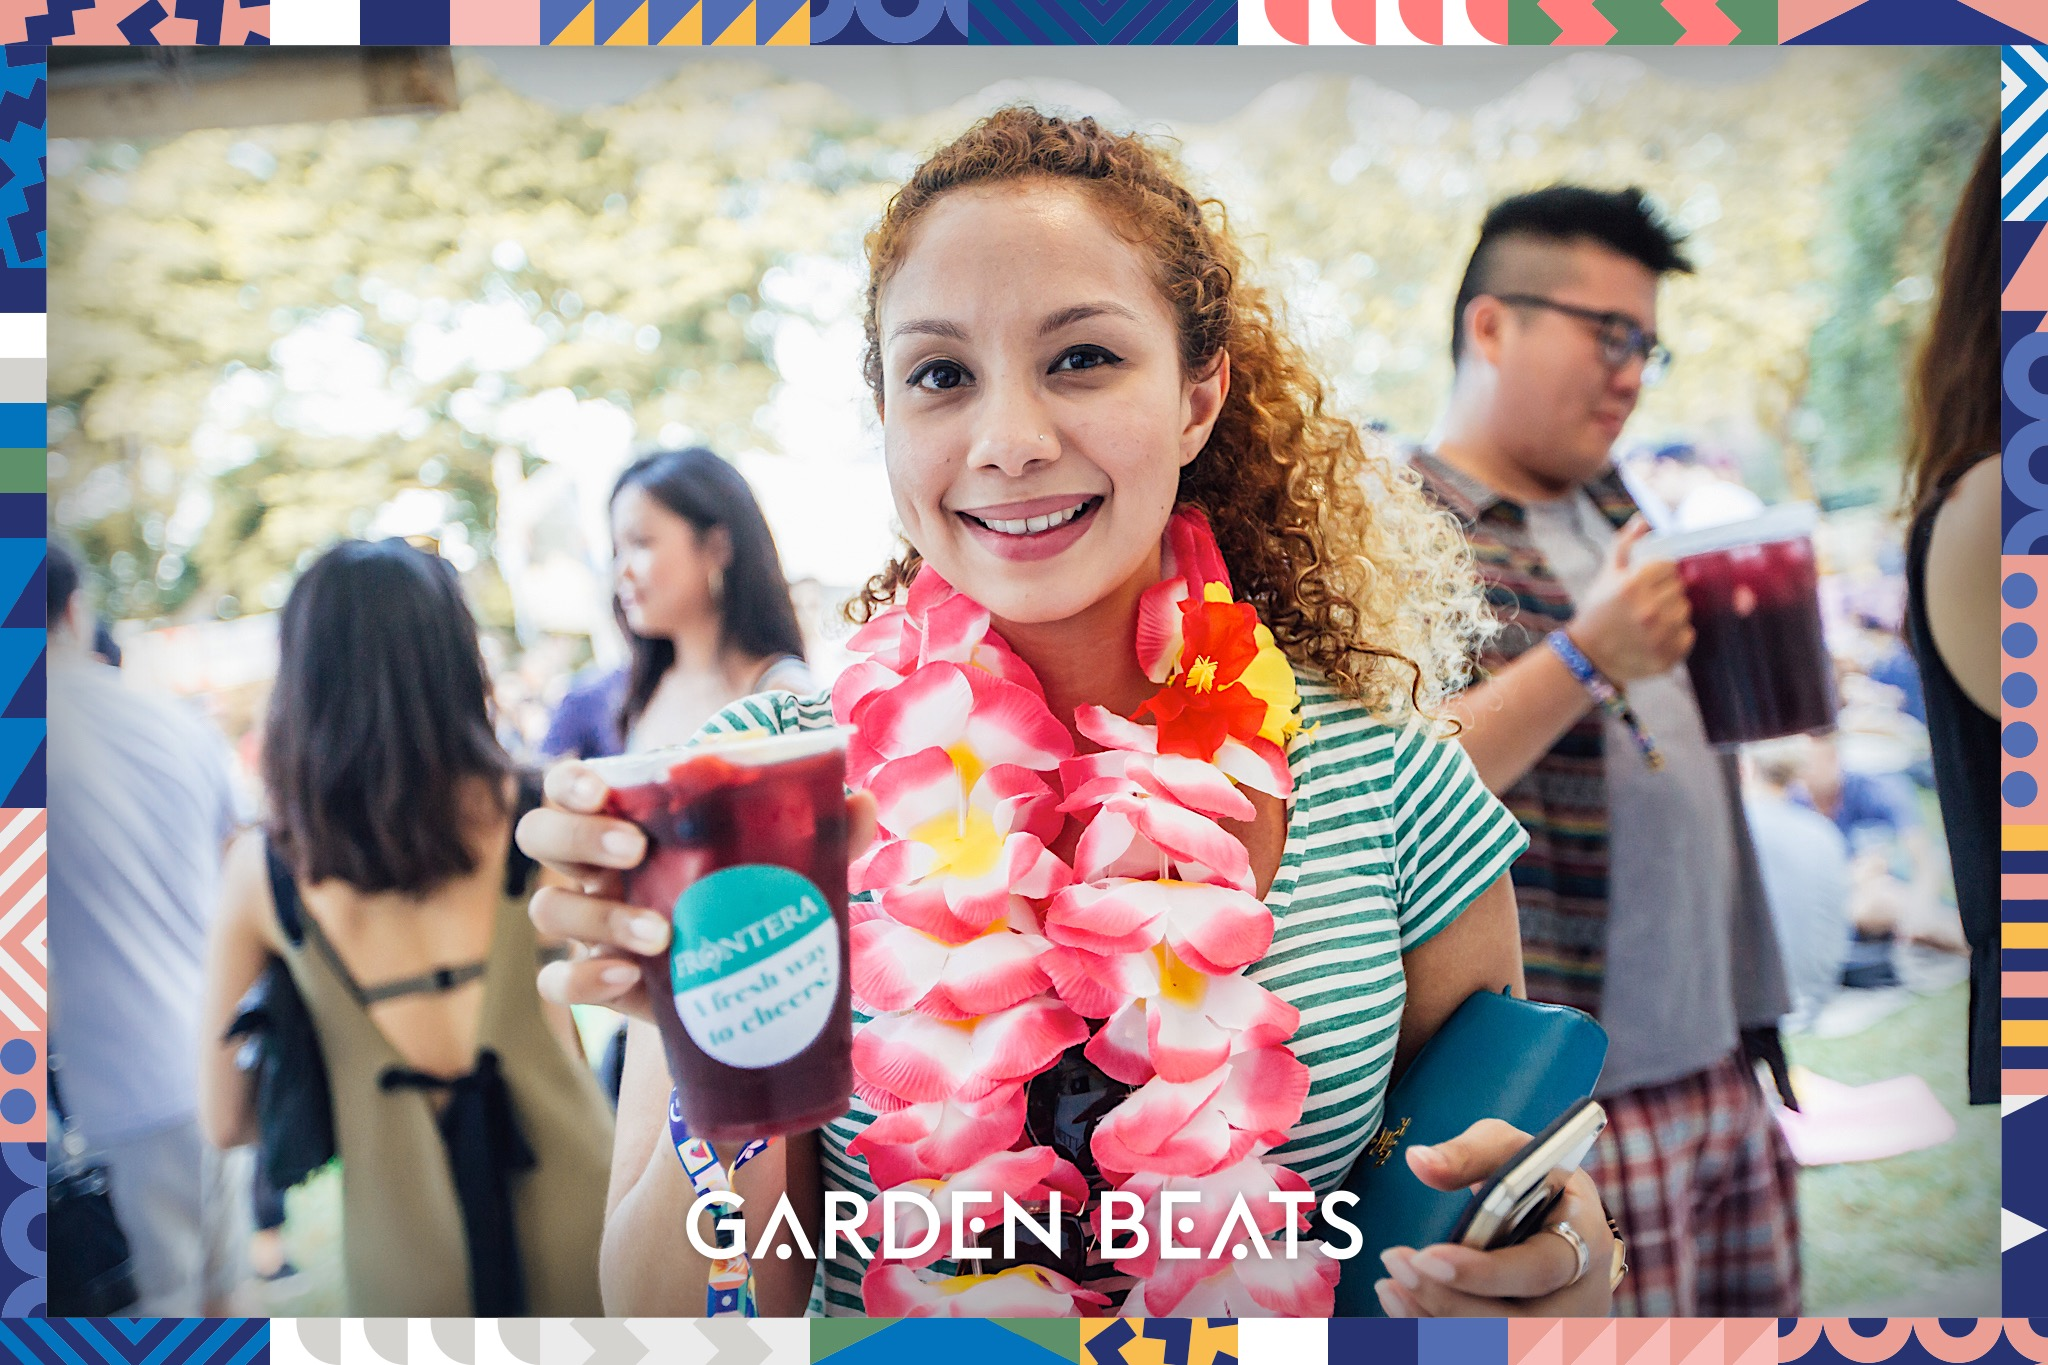 18032017_GardenBeats_Colossal548_WatermarkedGB.jpg